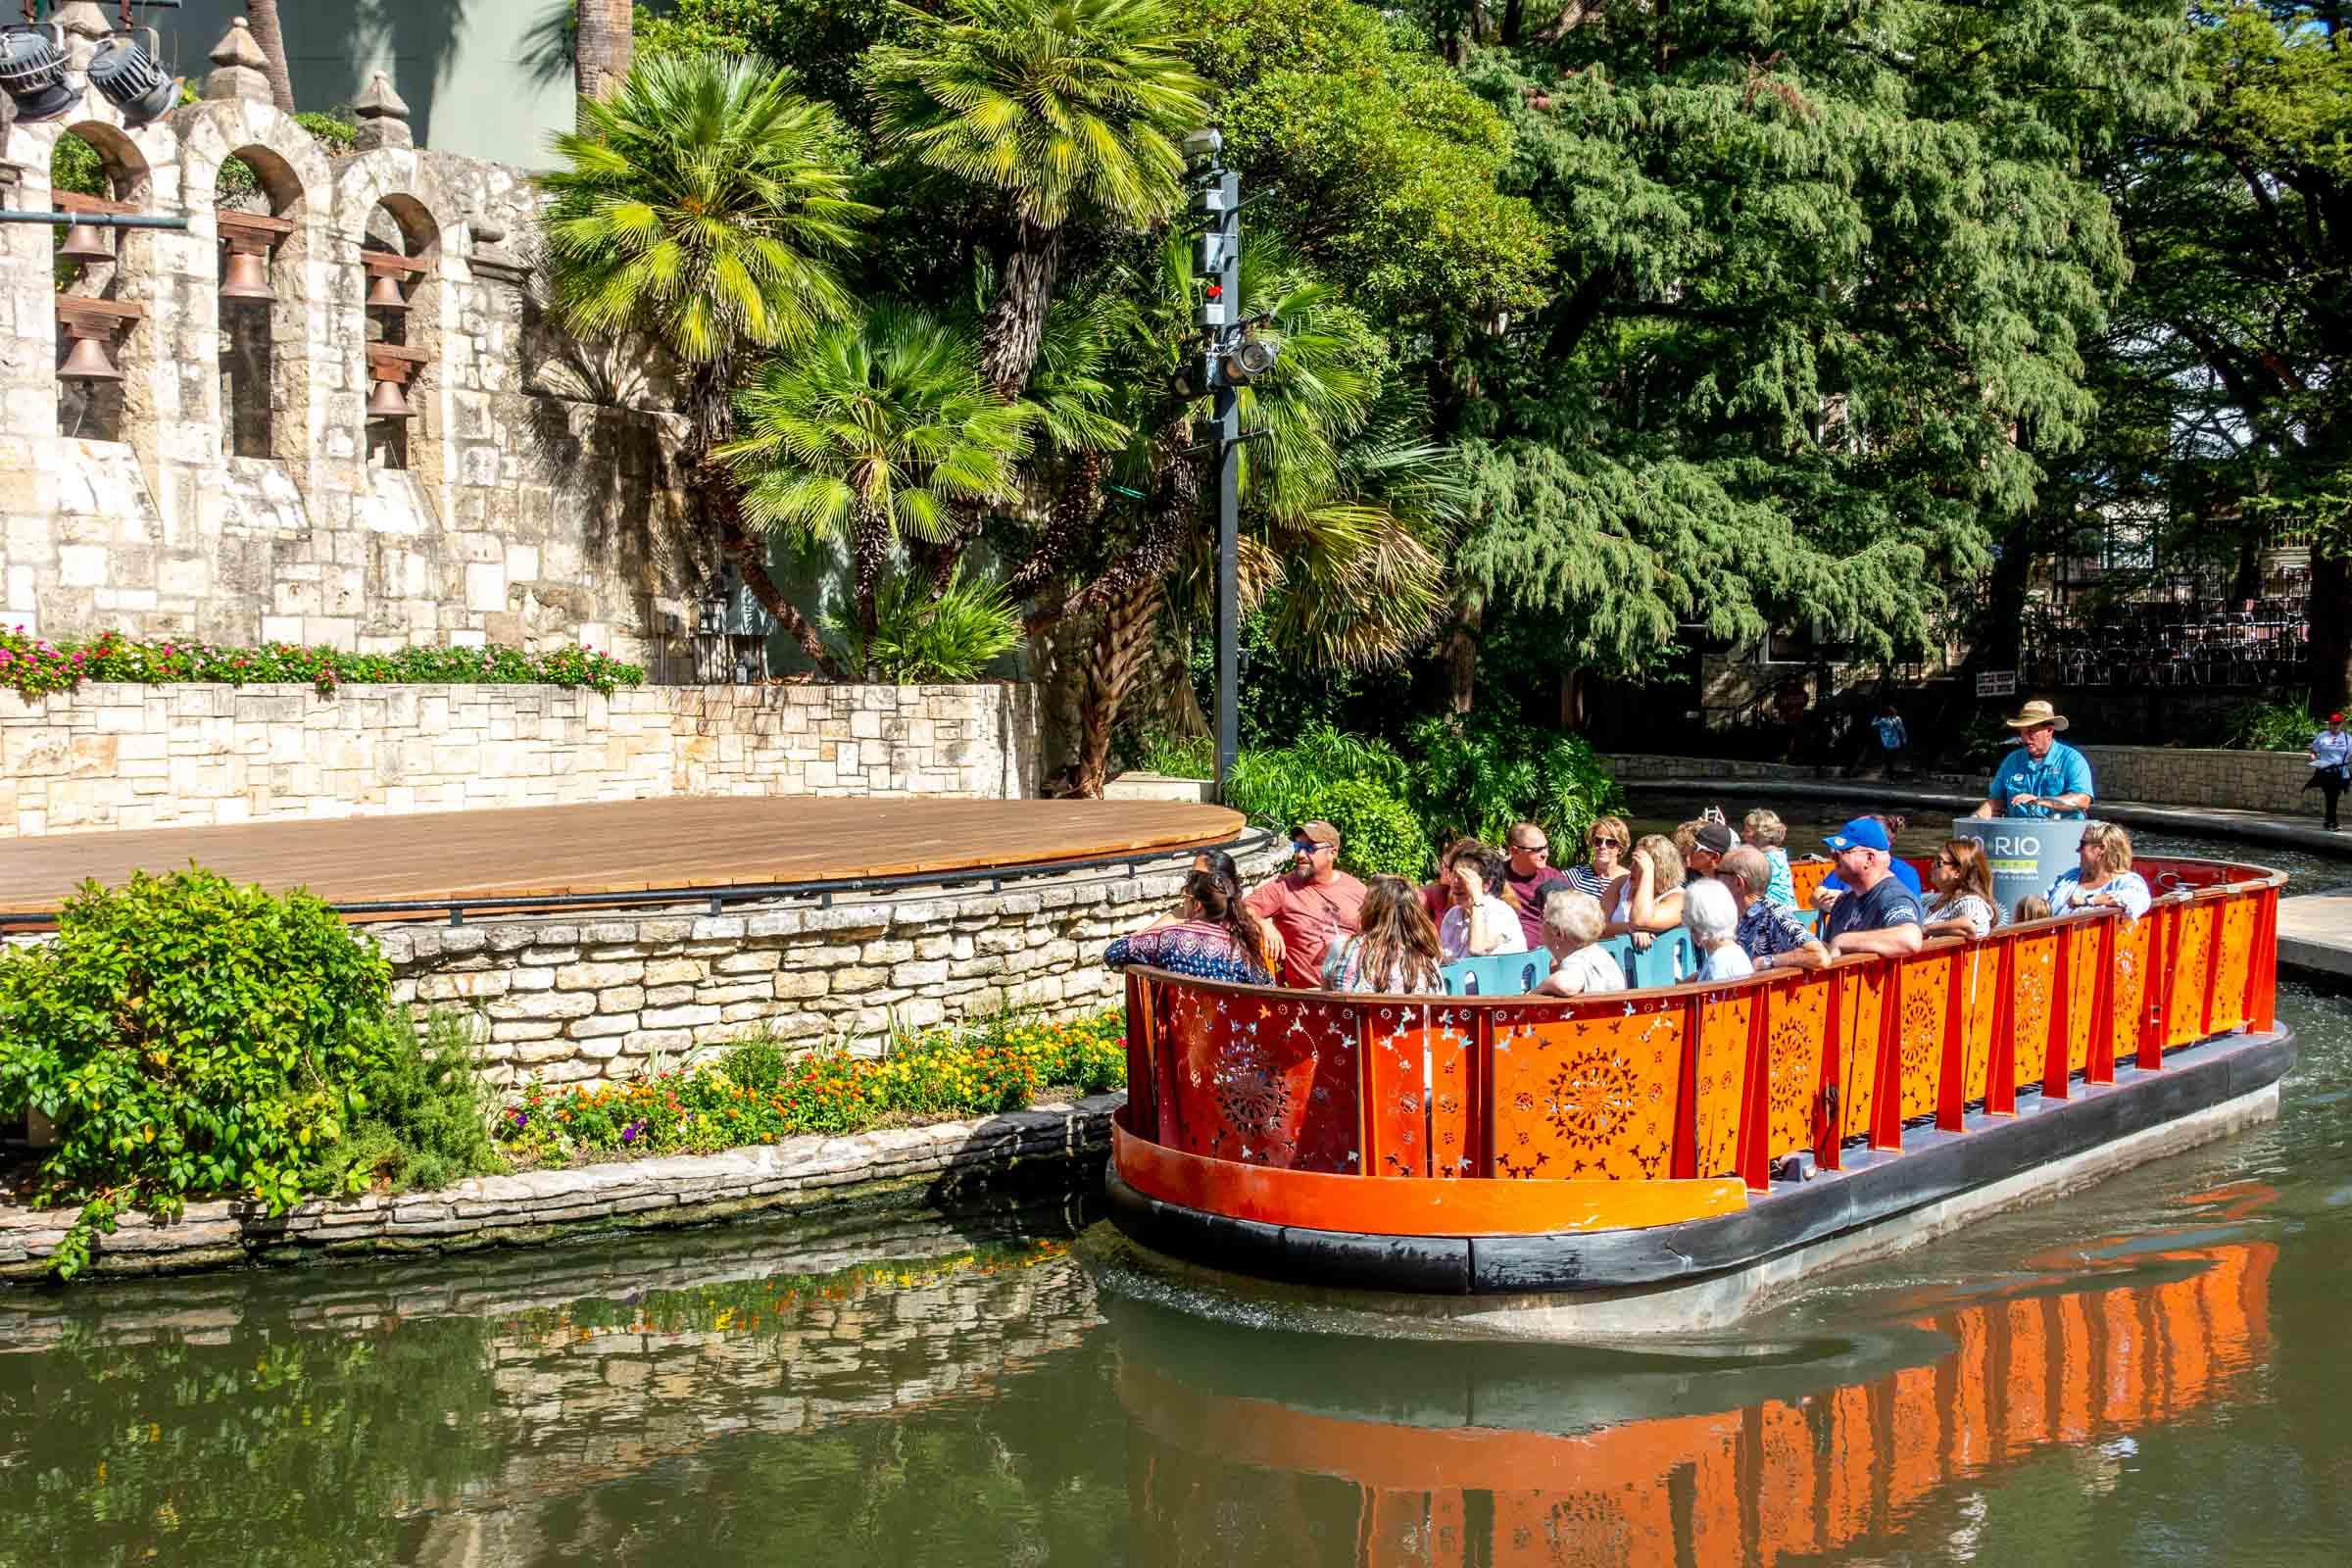 Orange boat filled with people in river along San Antonio RiverWalk